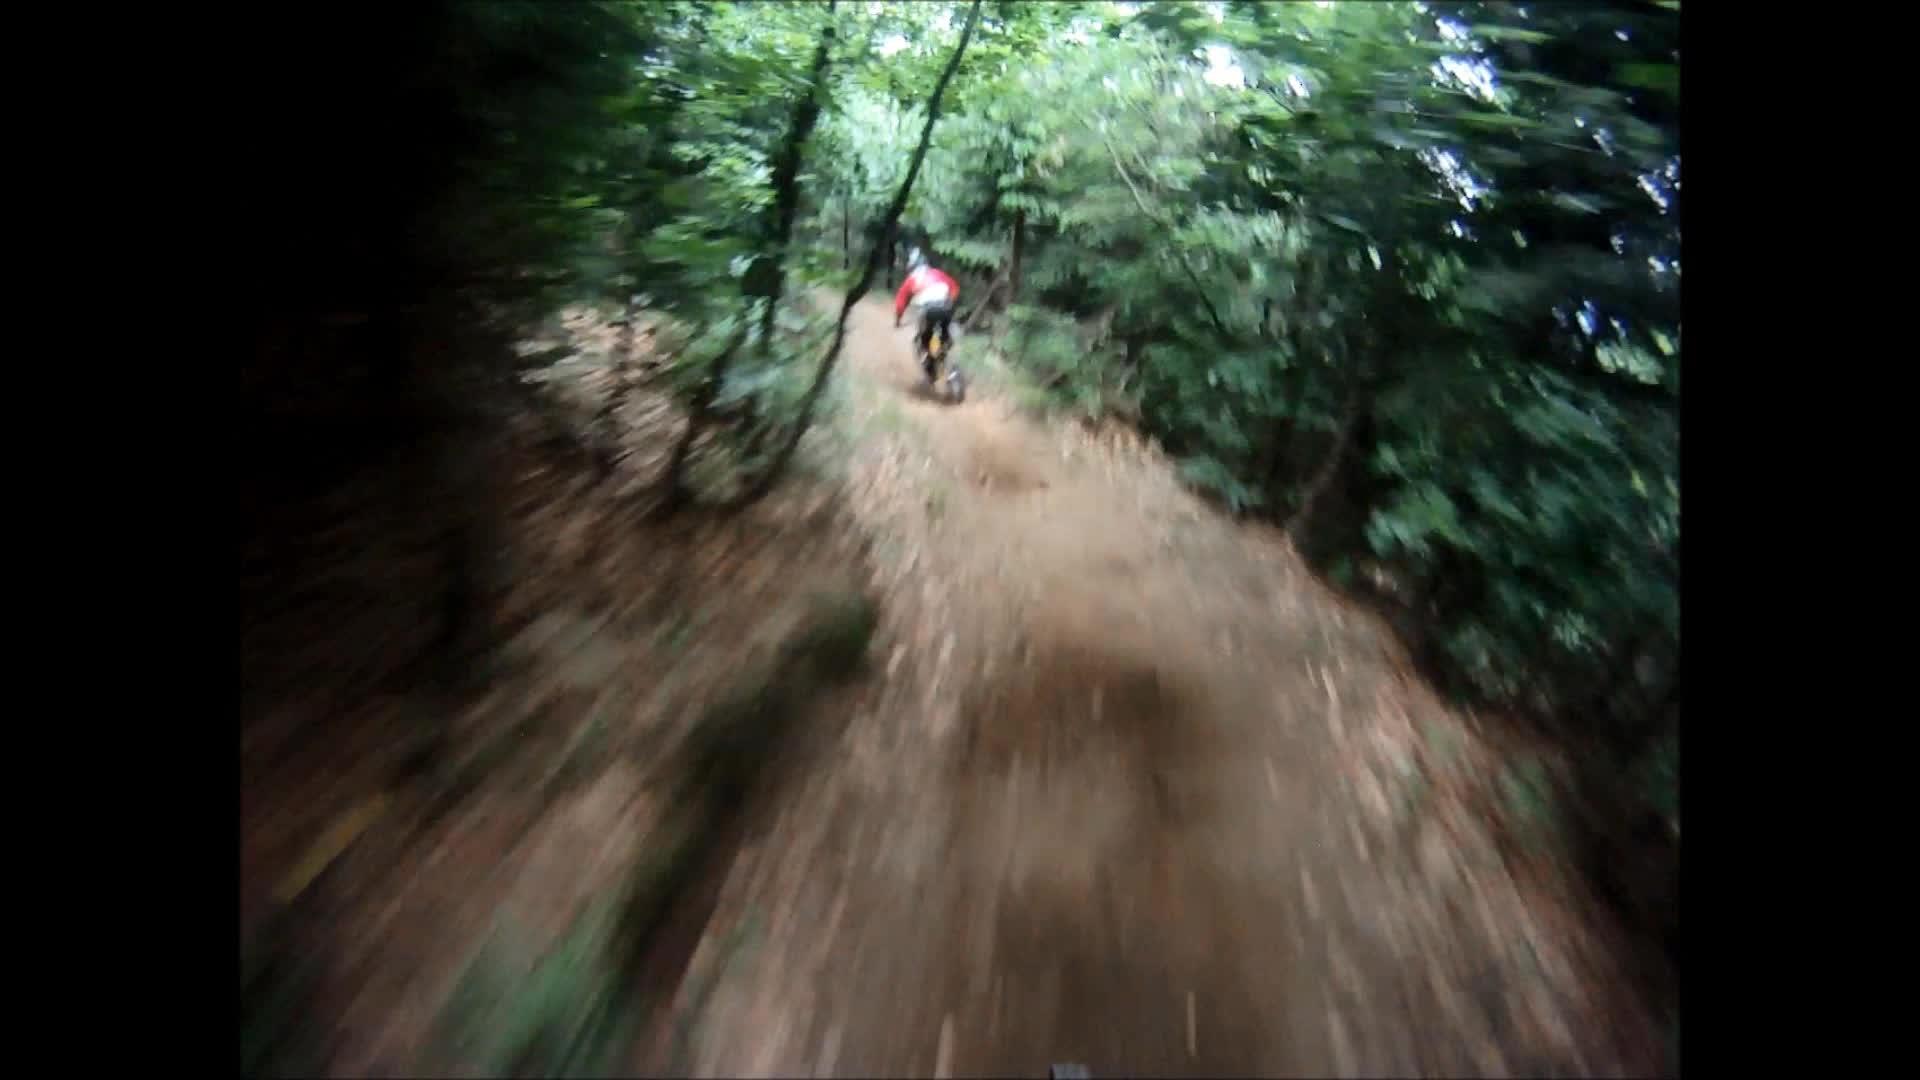 [RR] Fast&Dusty Team RatisbonRacing @ Geißkopf